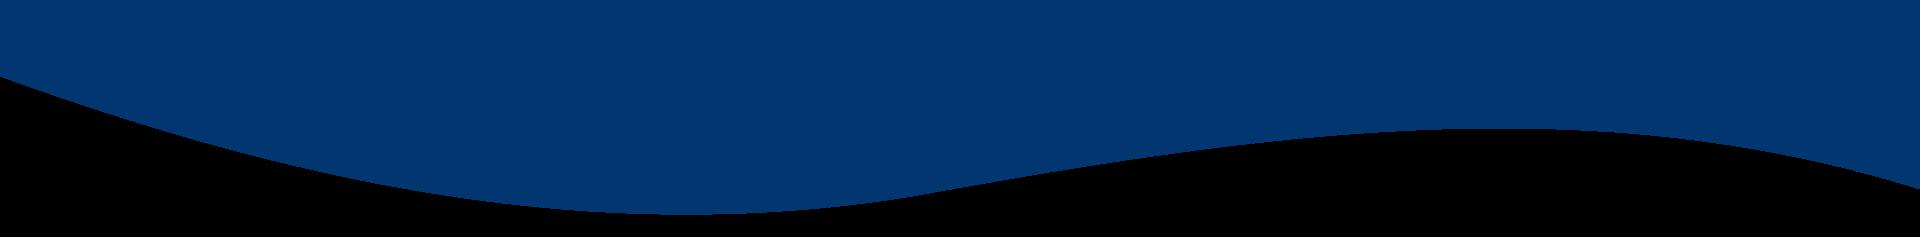 balk-blauw-onder-evelo